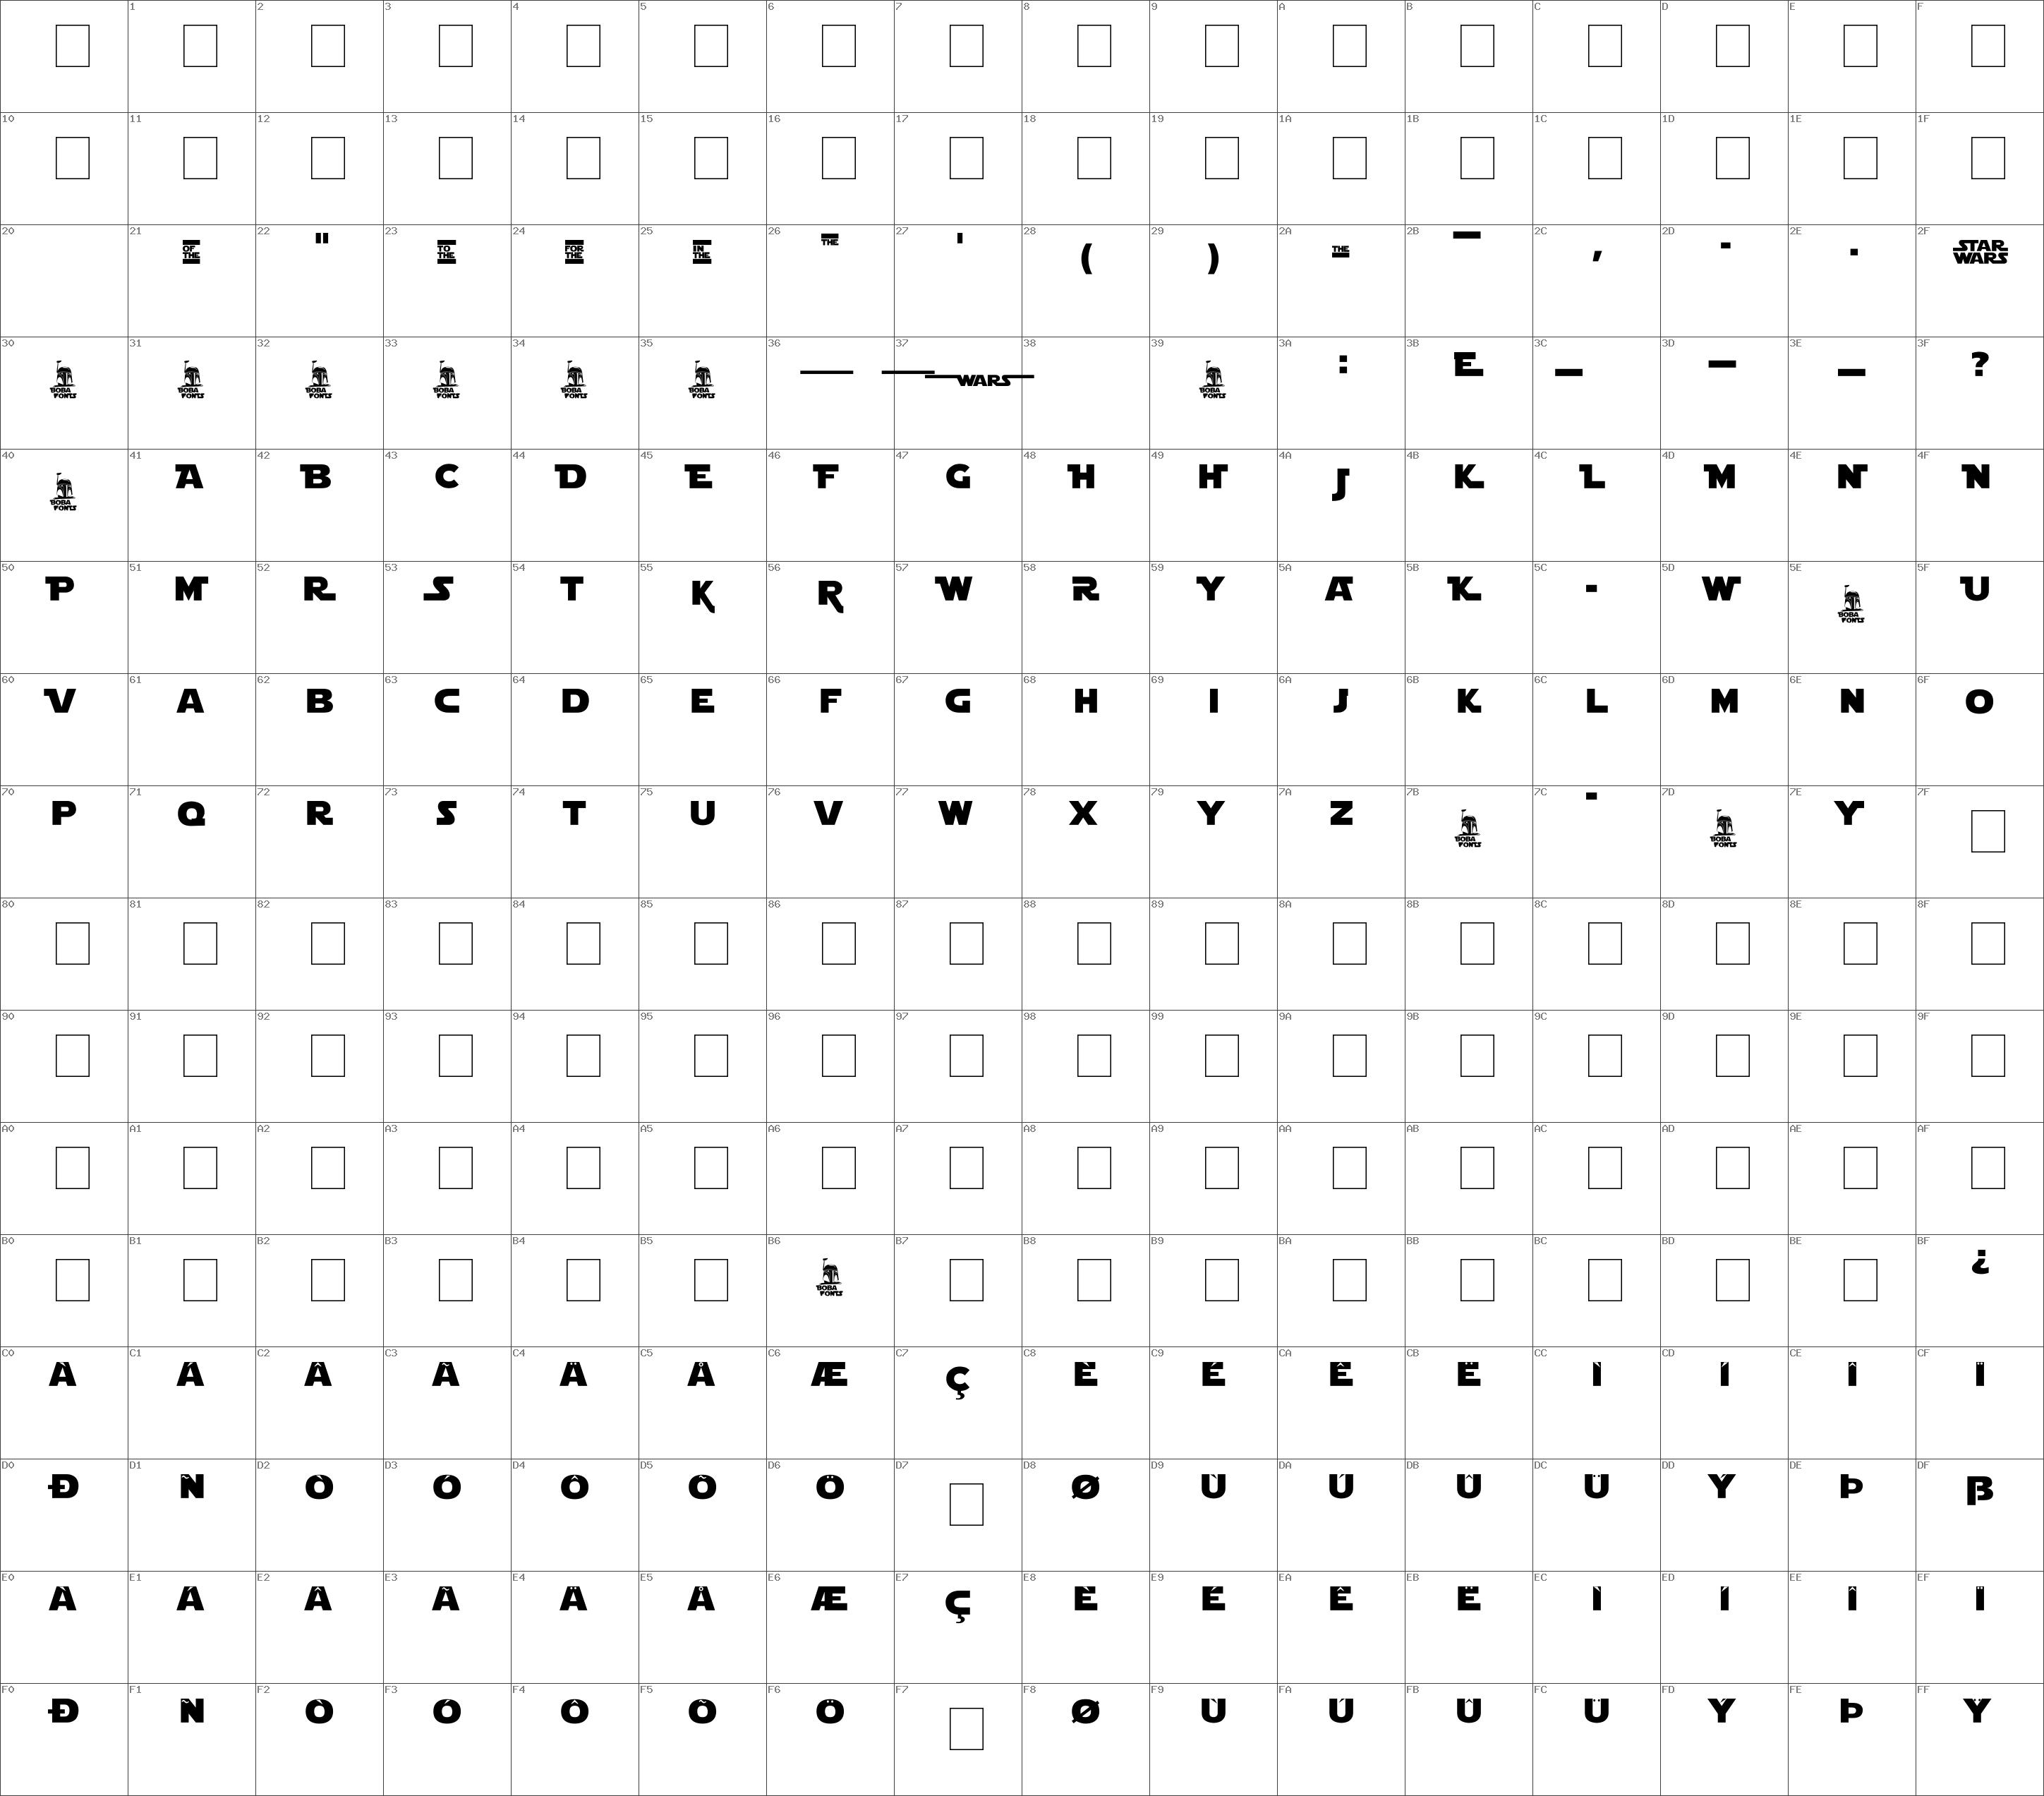 star-jedi-logo-doubleline2-regular-12790